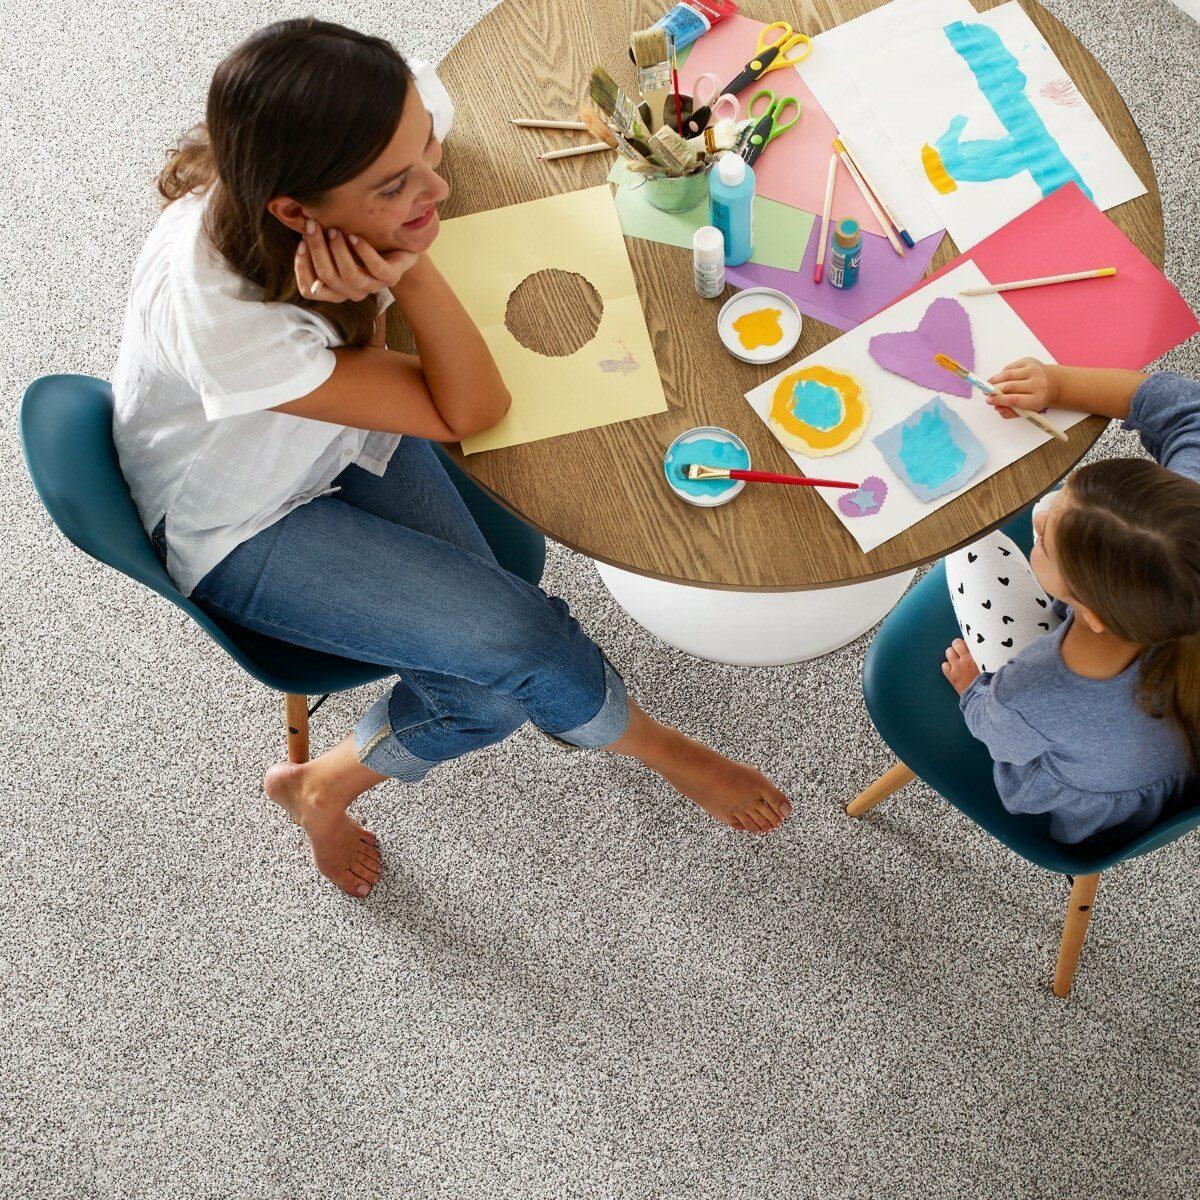 Find Your Comfort Accent | Pierce Flooring